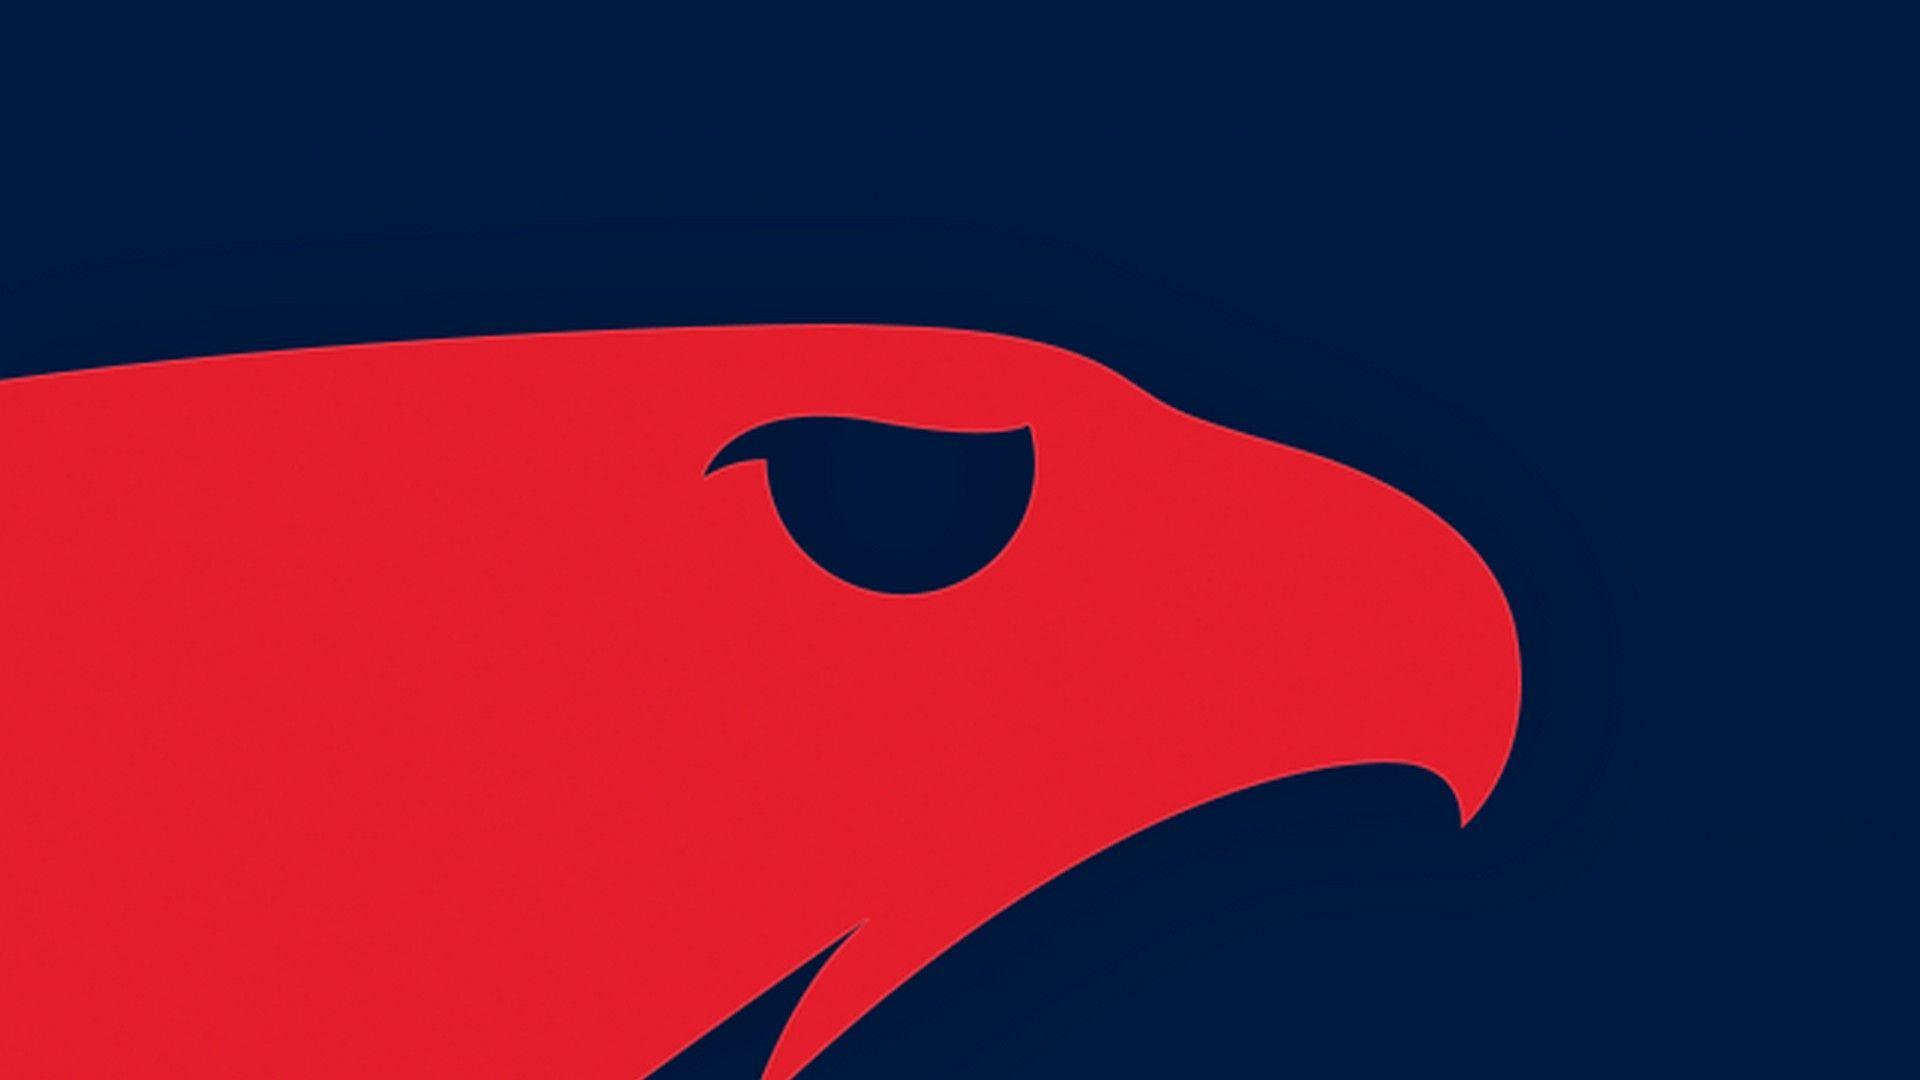 Hd Atlanta Hawks Backgrounds Wallpaper Atlanta Hawks Basketball